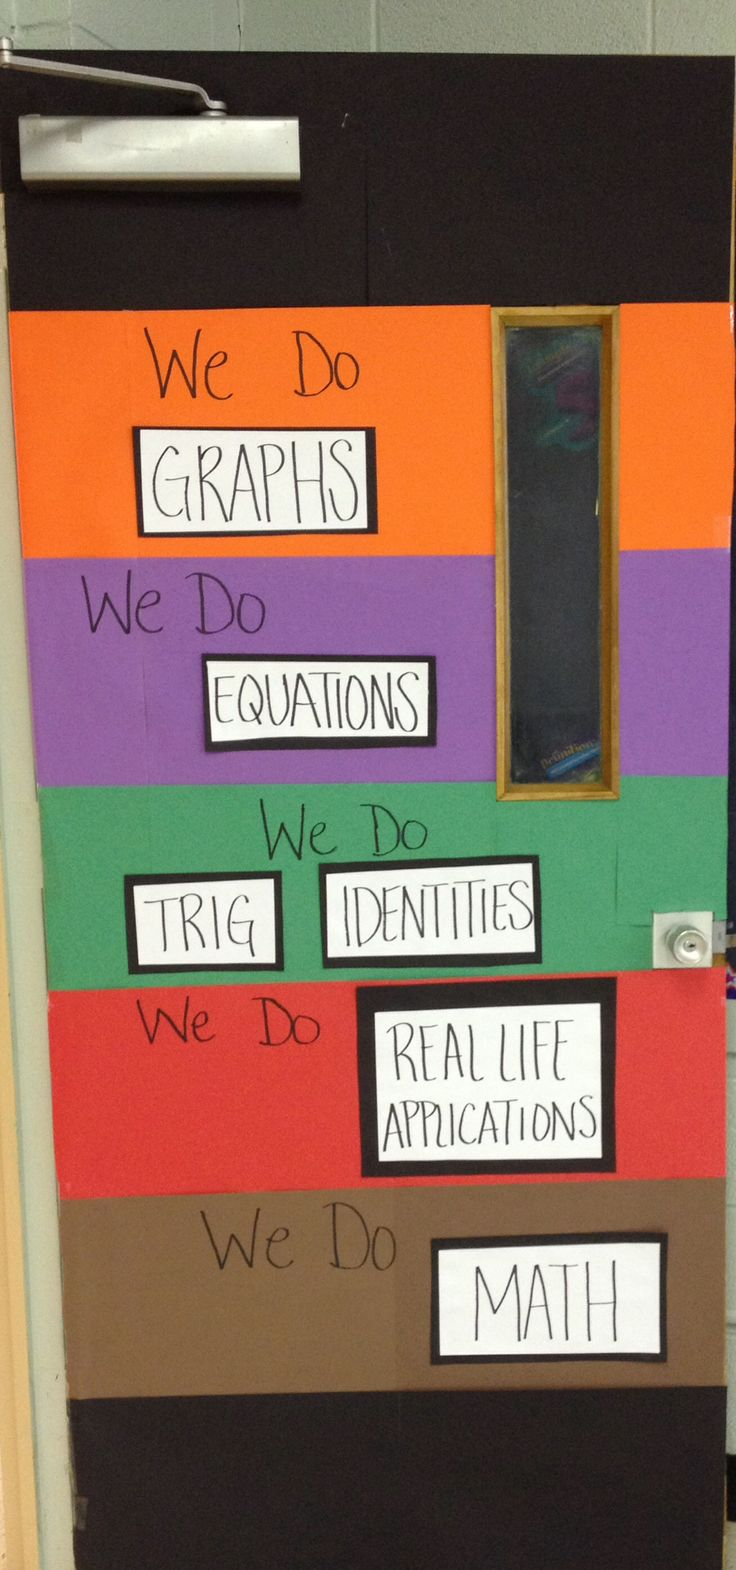 Math Classroom Door Decoration Ideas ~ Math door decorations classroom pinterest